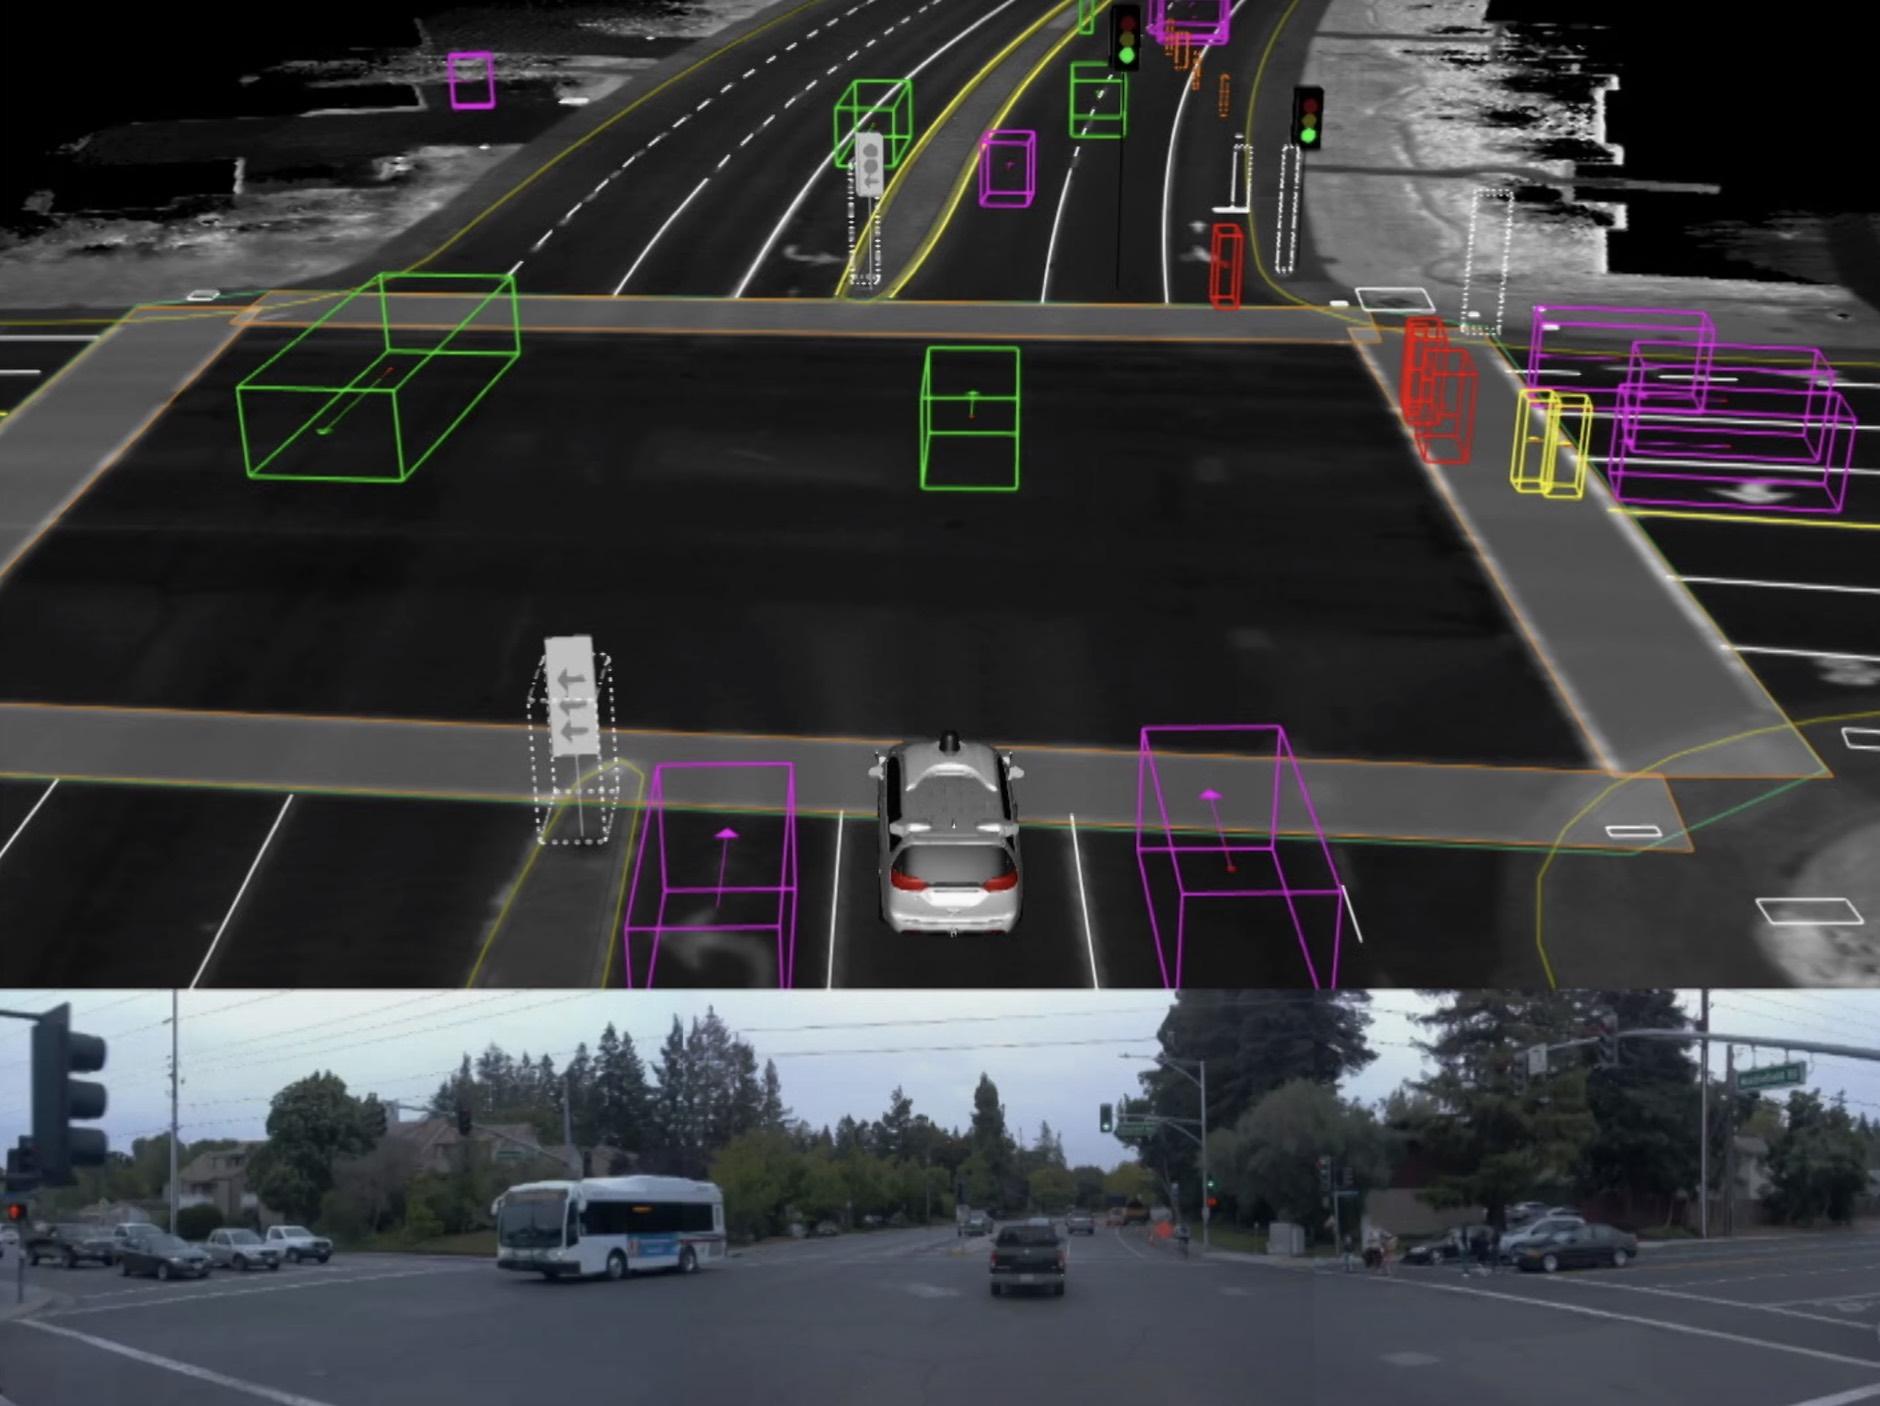 waymo self-driving car technology